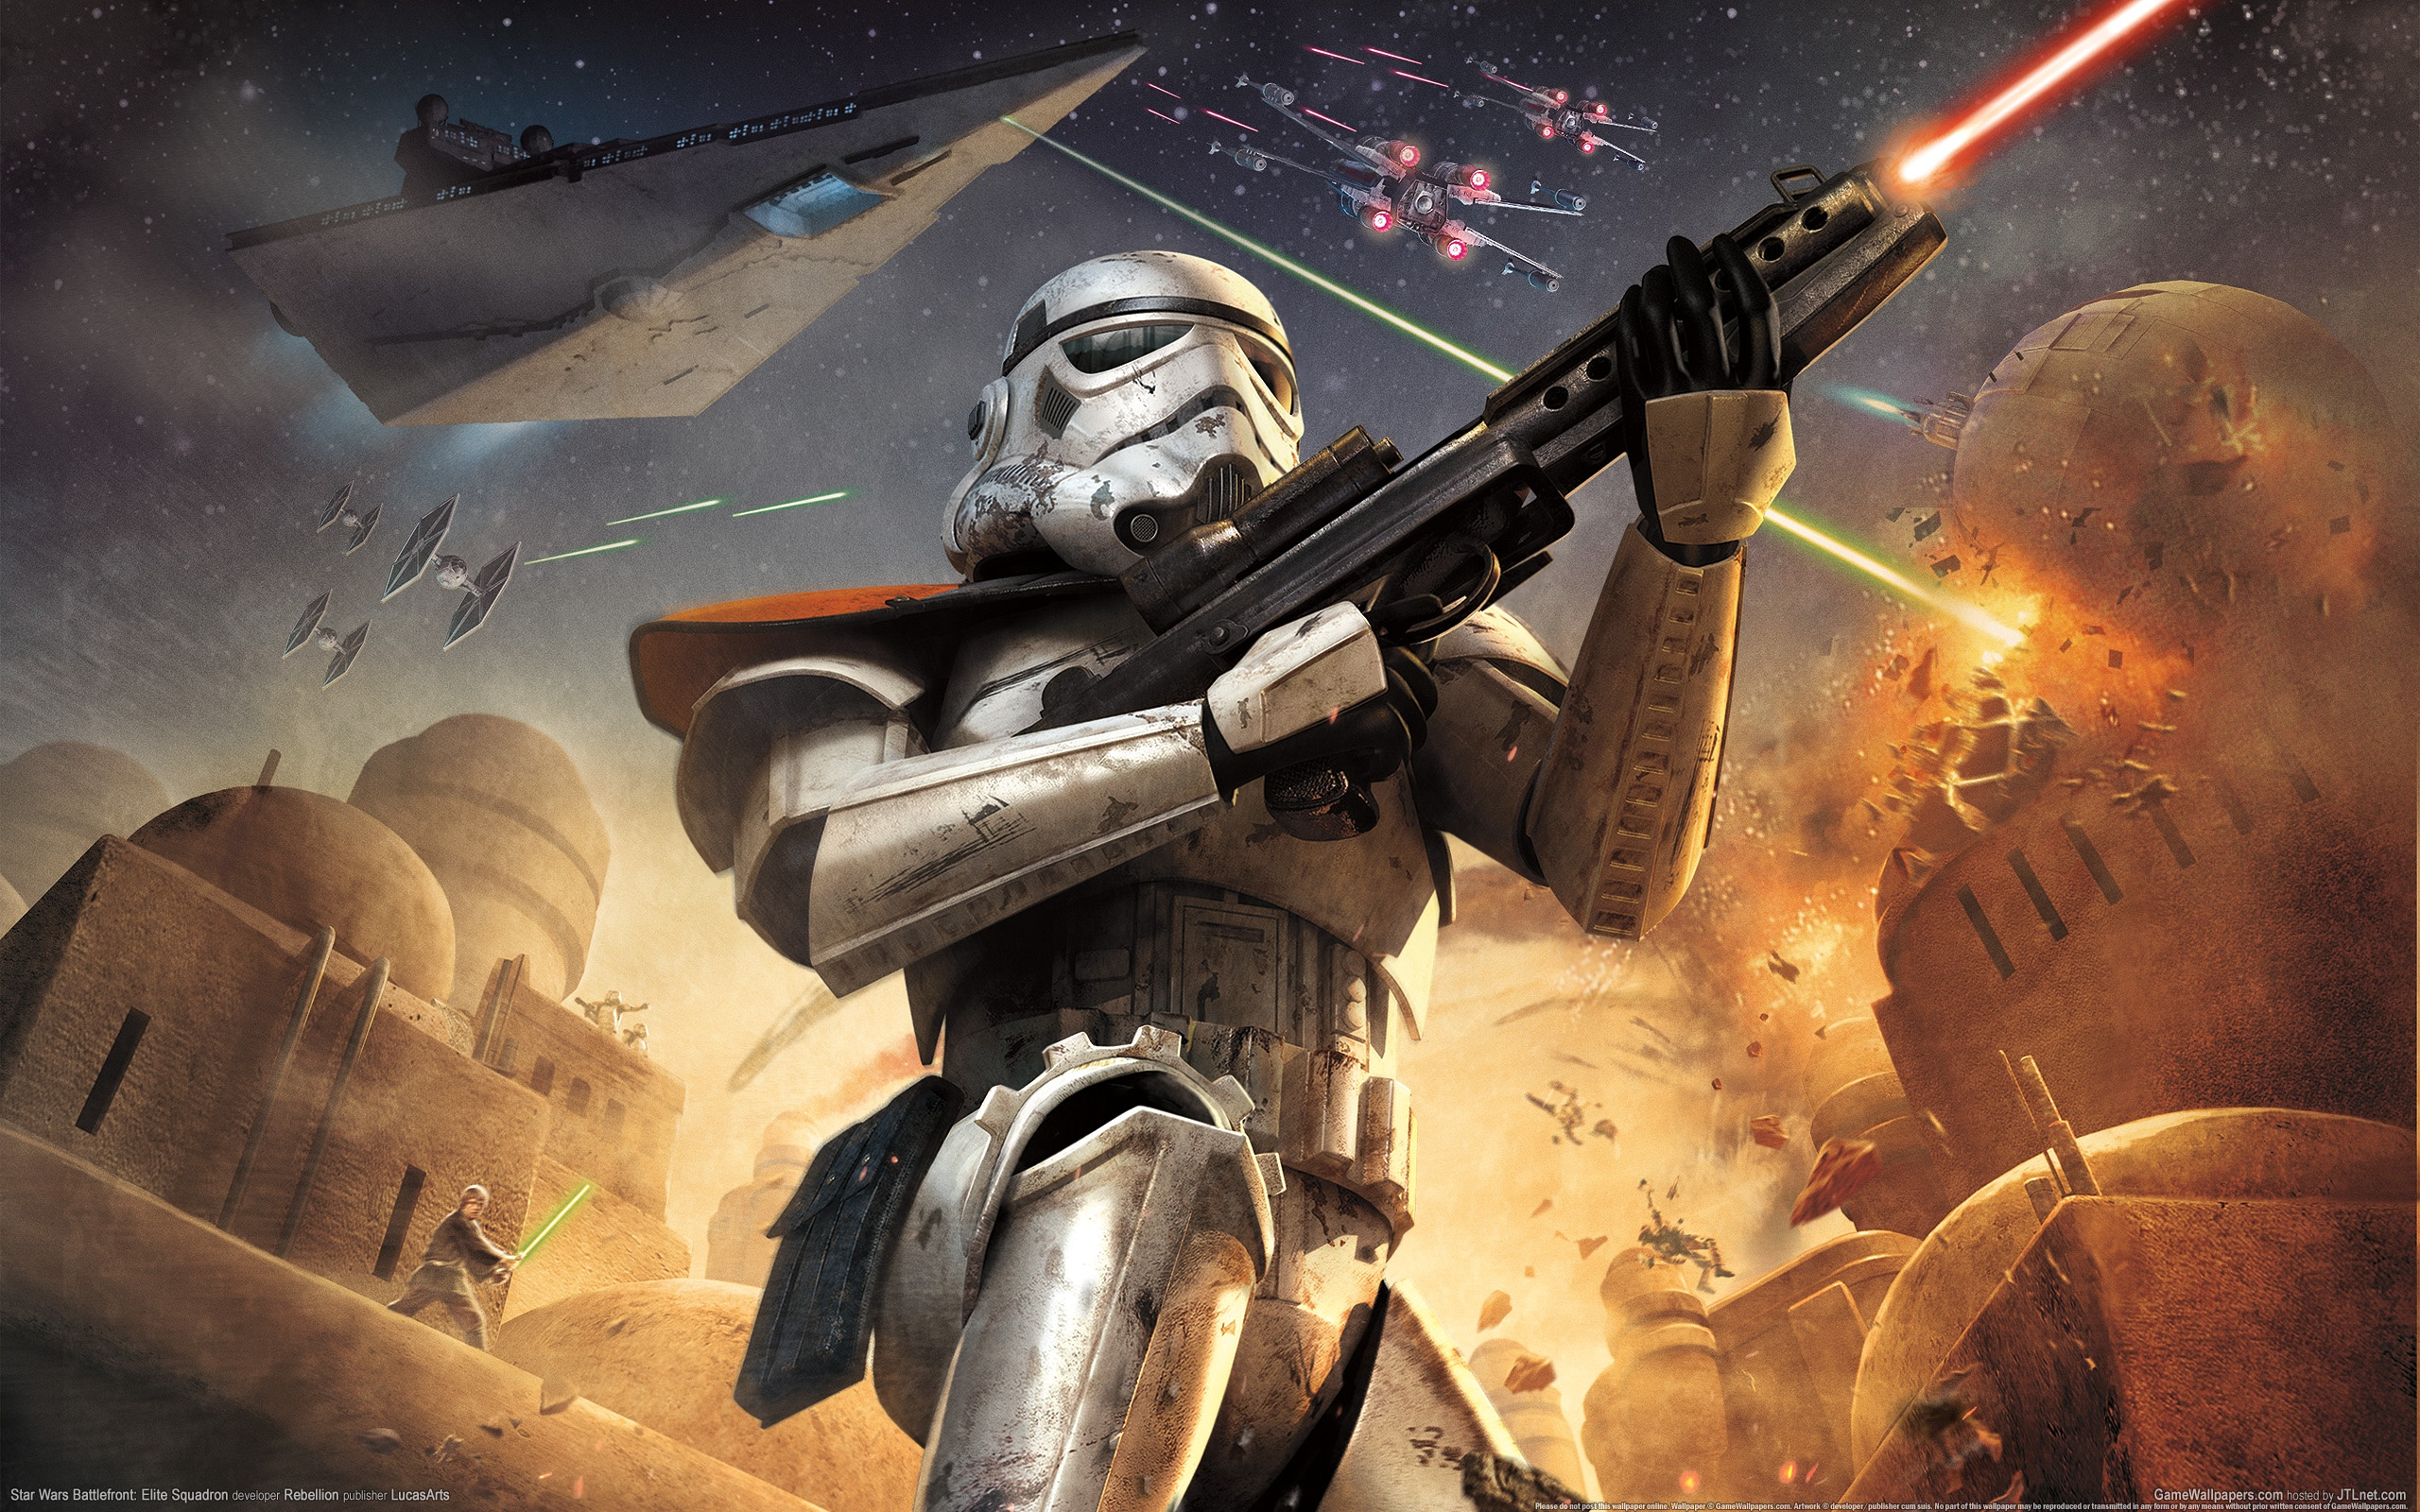 huge star wars wallpapers - photo #47